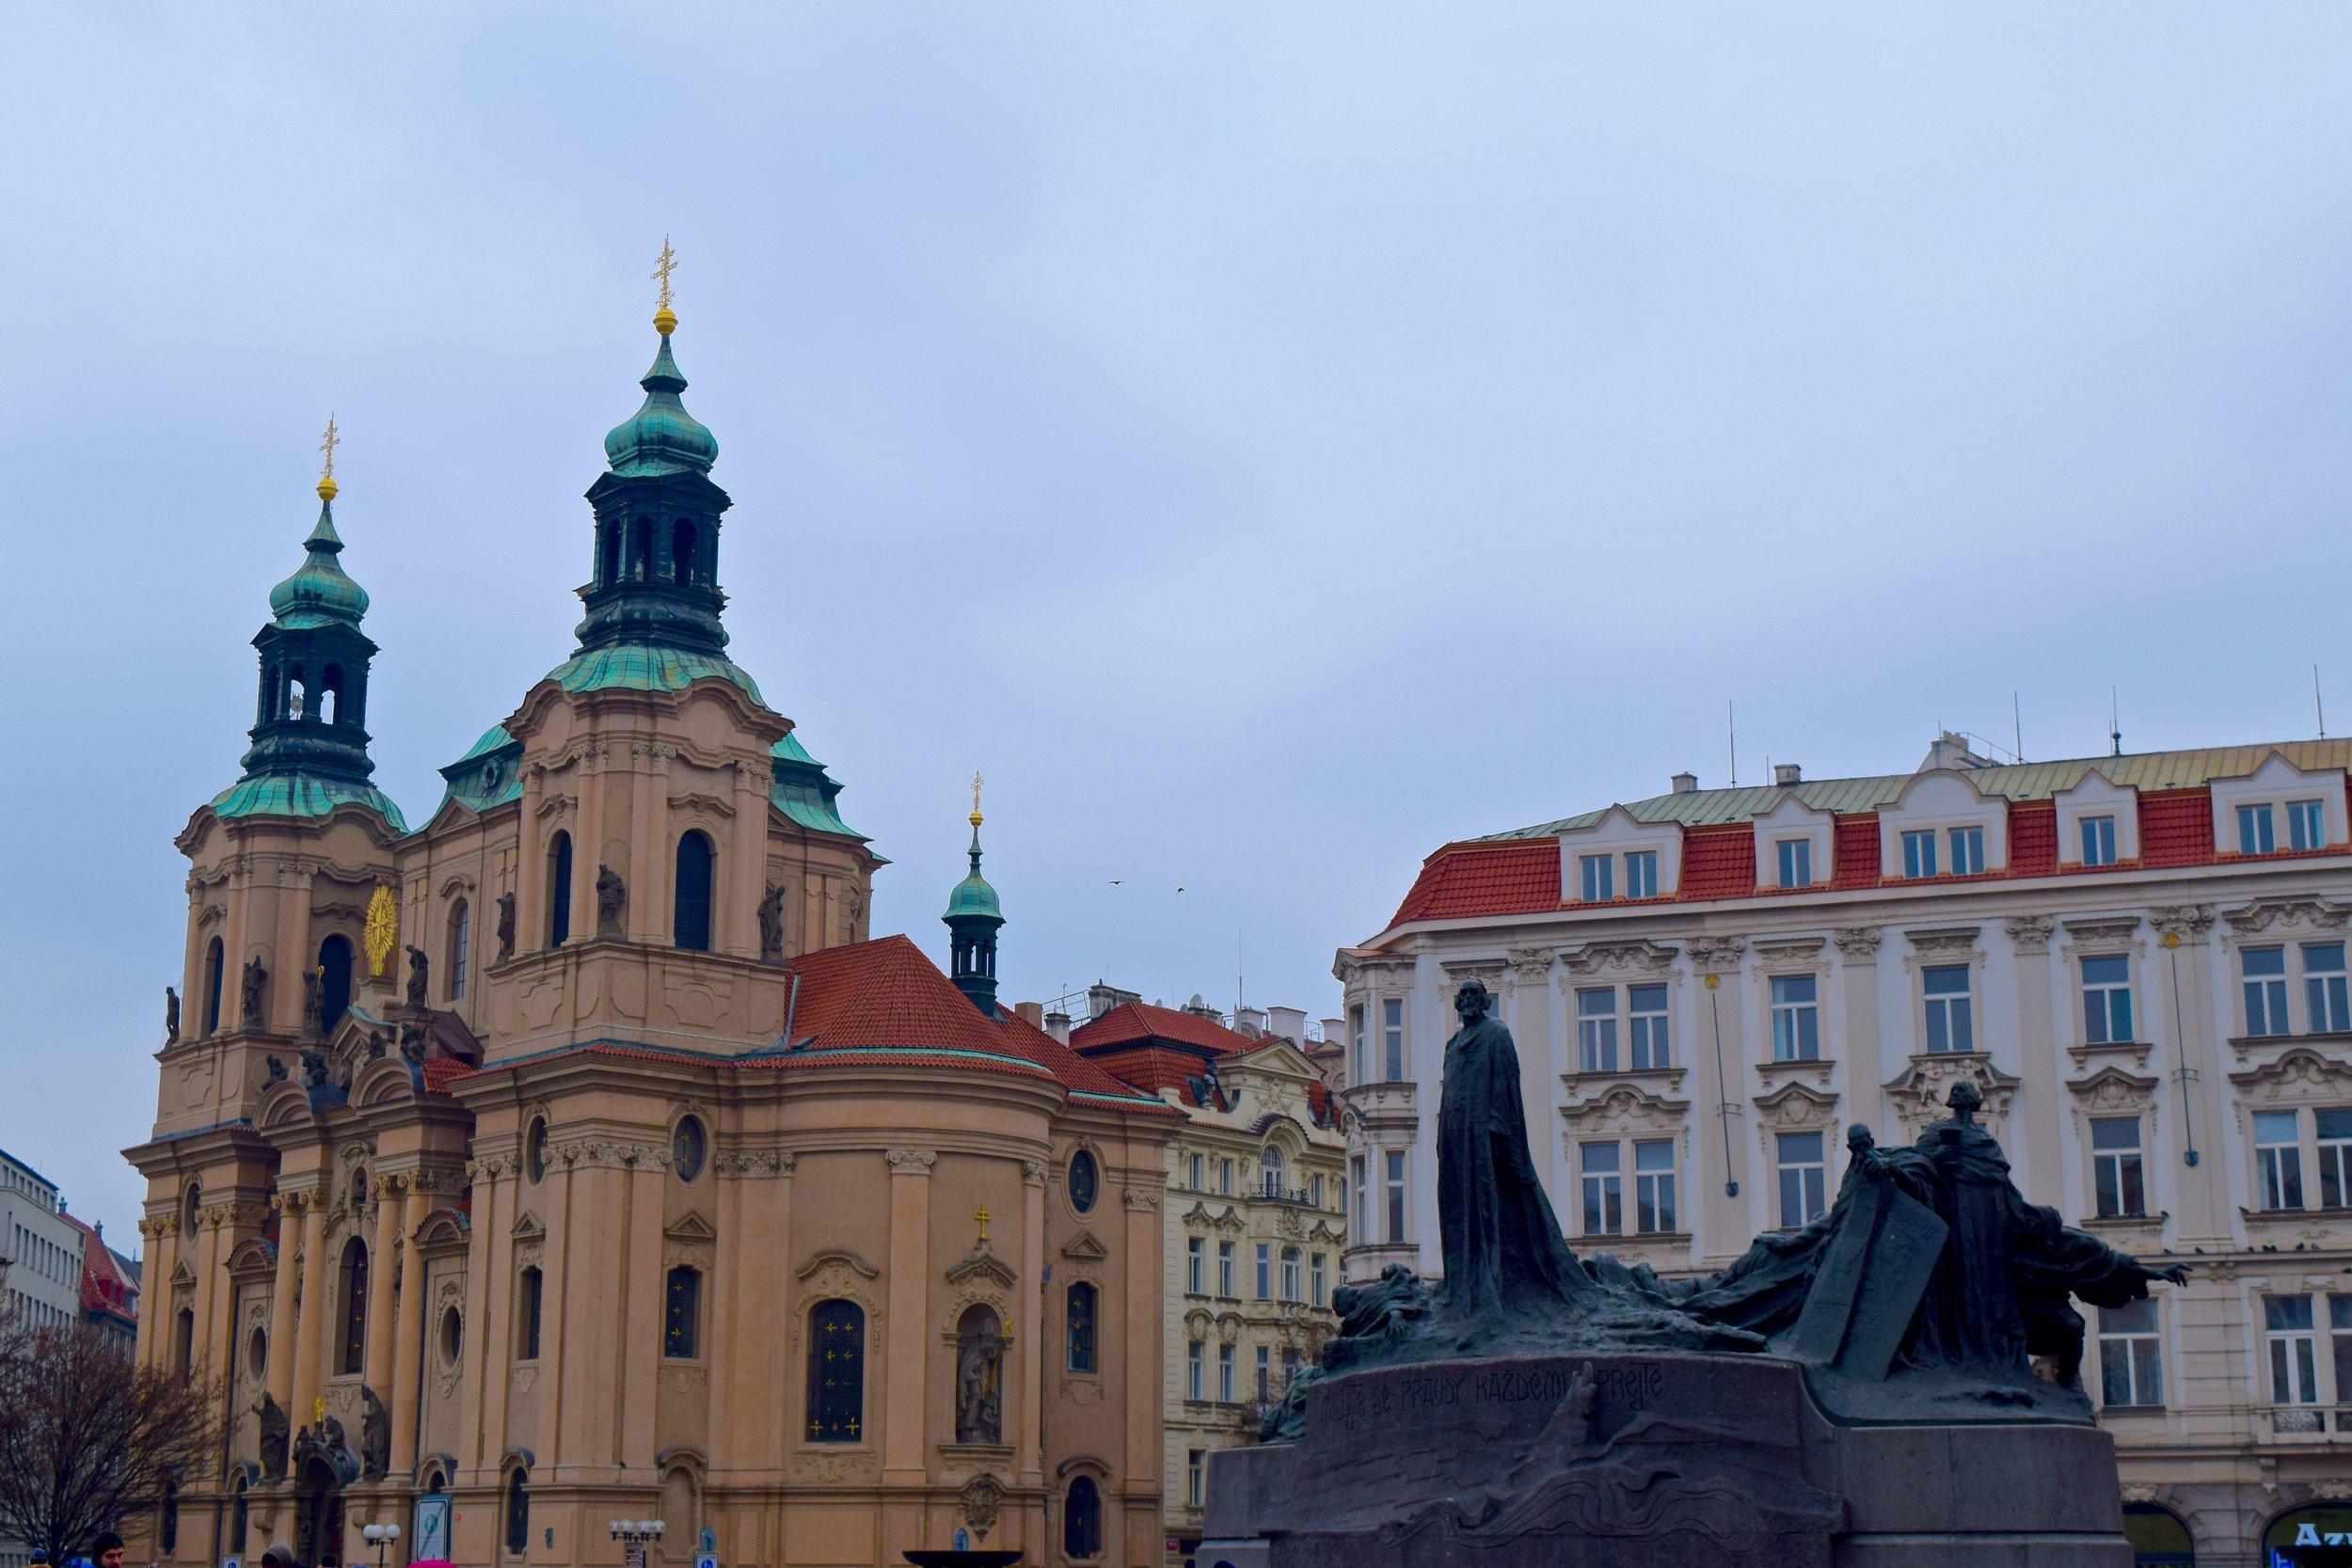 St. Nicholas Church & Jan Hus Monument